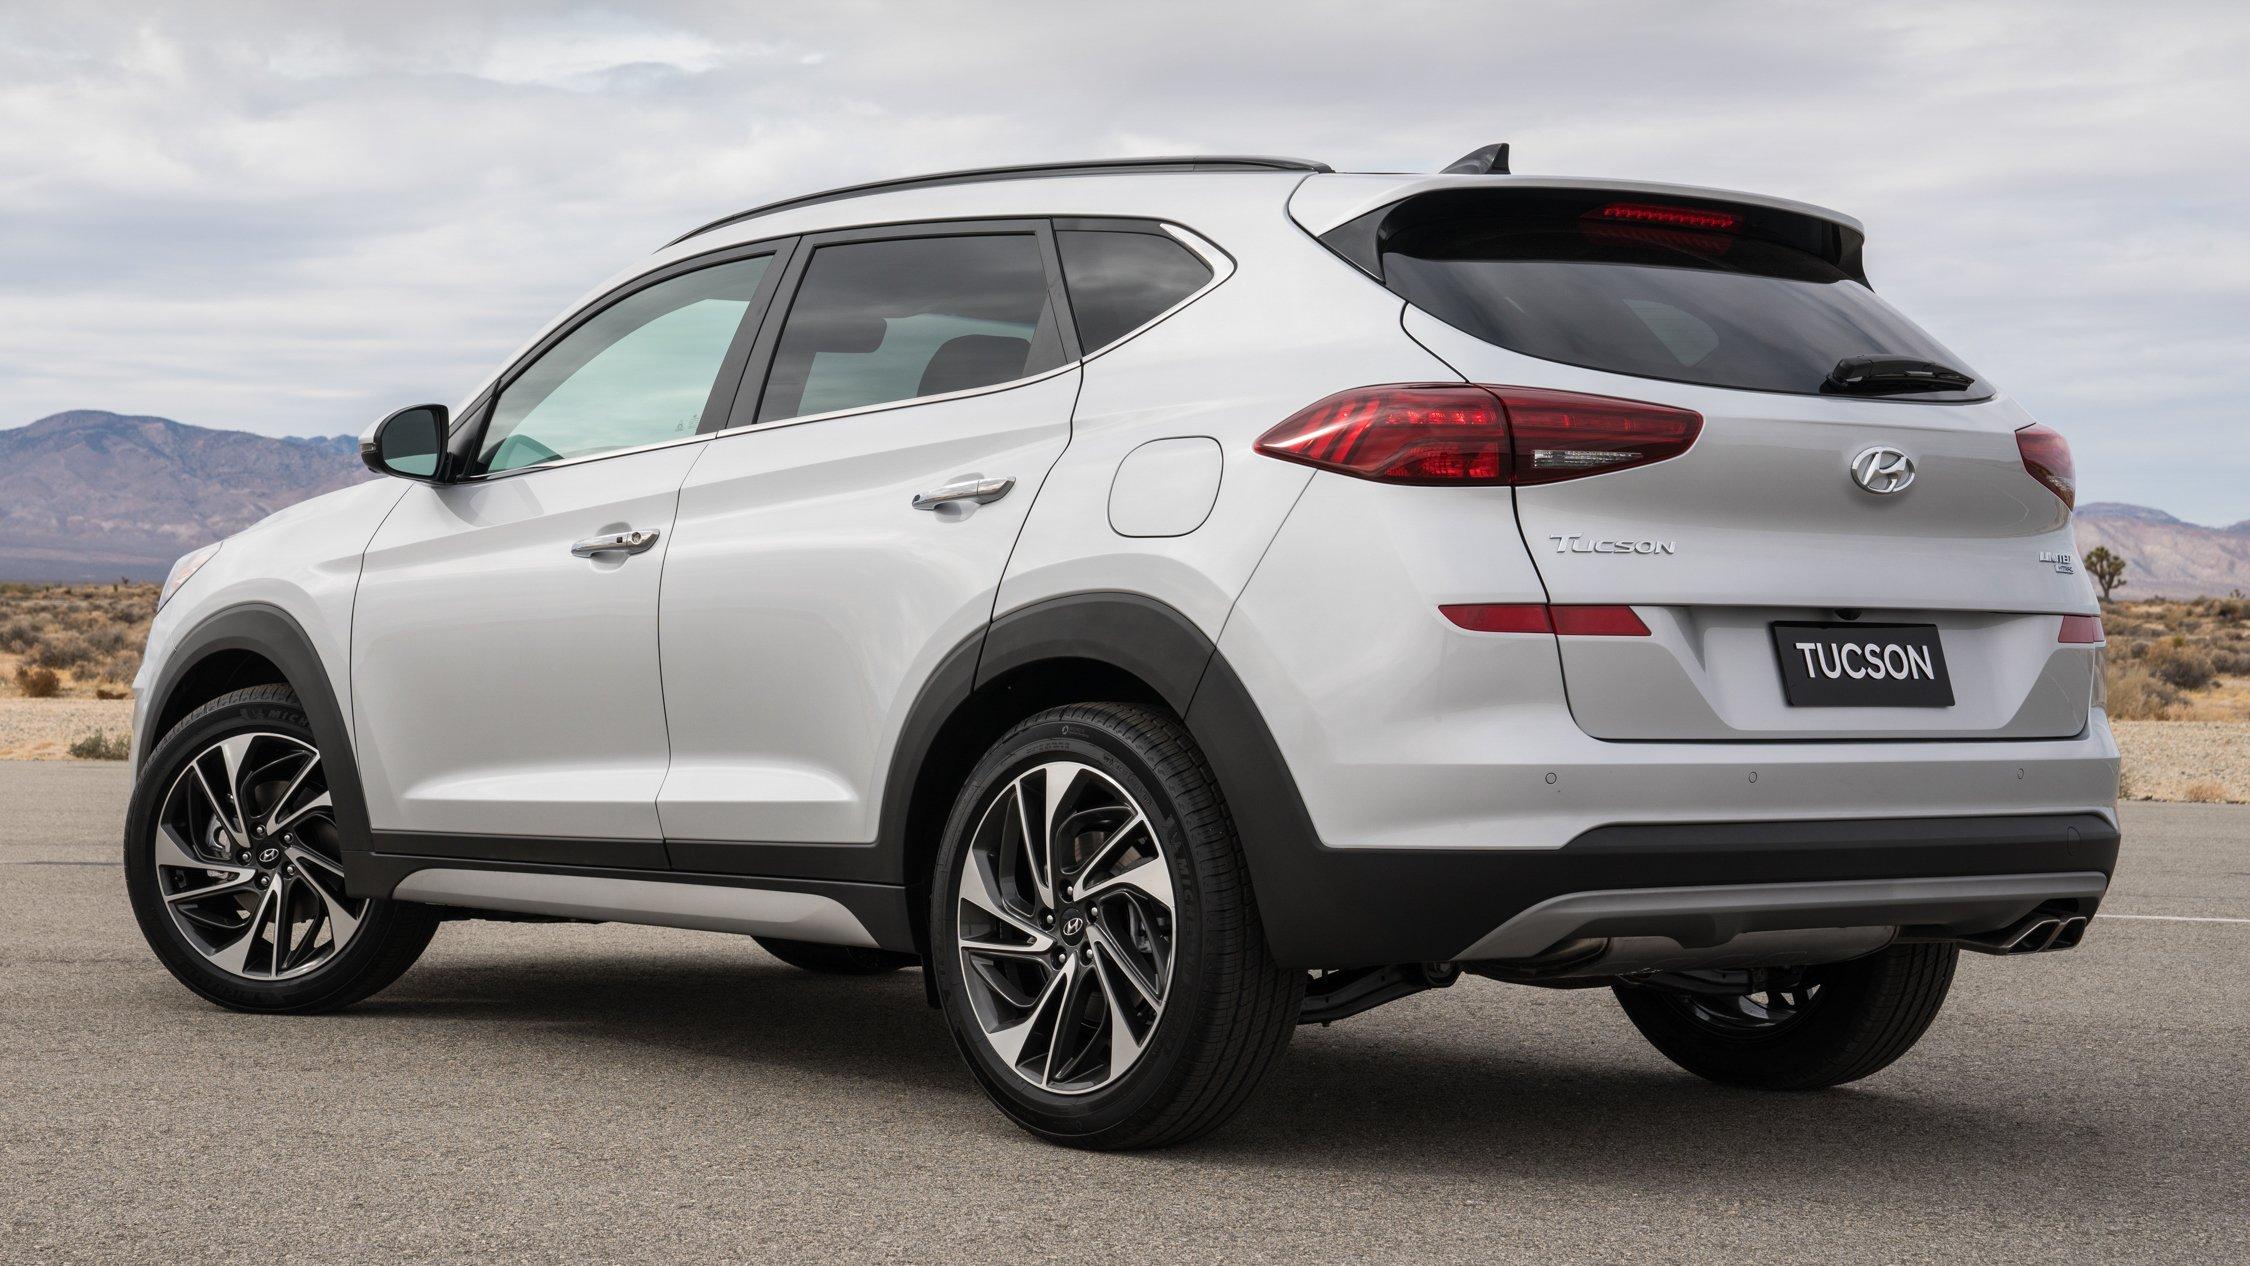 Hyundai Tucson Facelift 2018 >> 2019 Hyundai Tucson facelift drops turbo, DCT in US Paul Tan - Image 799784